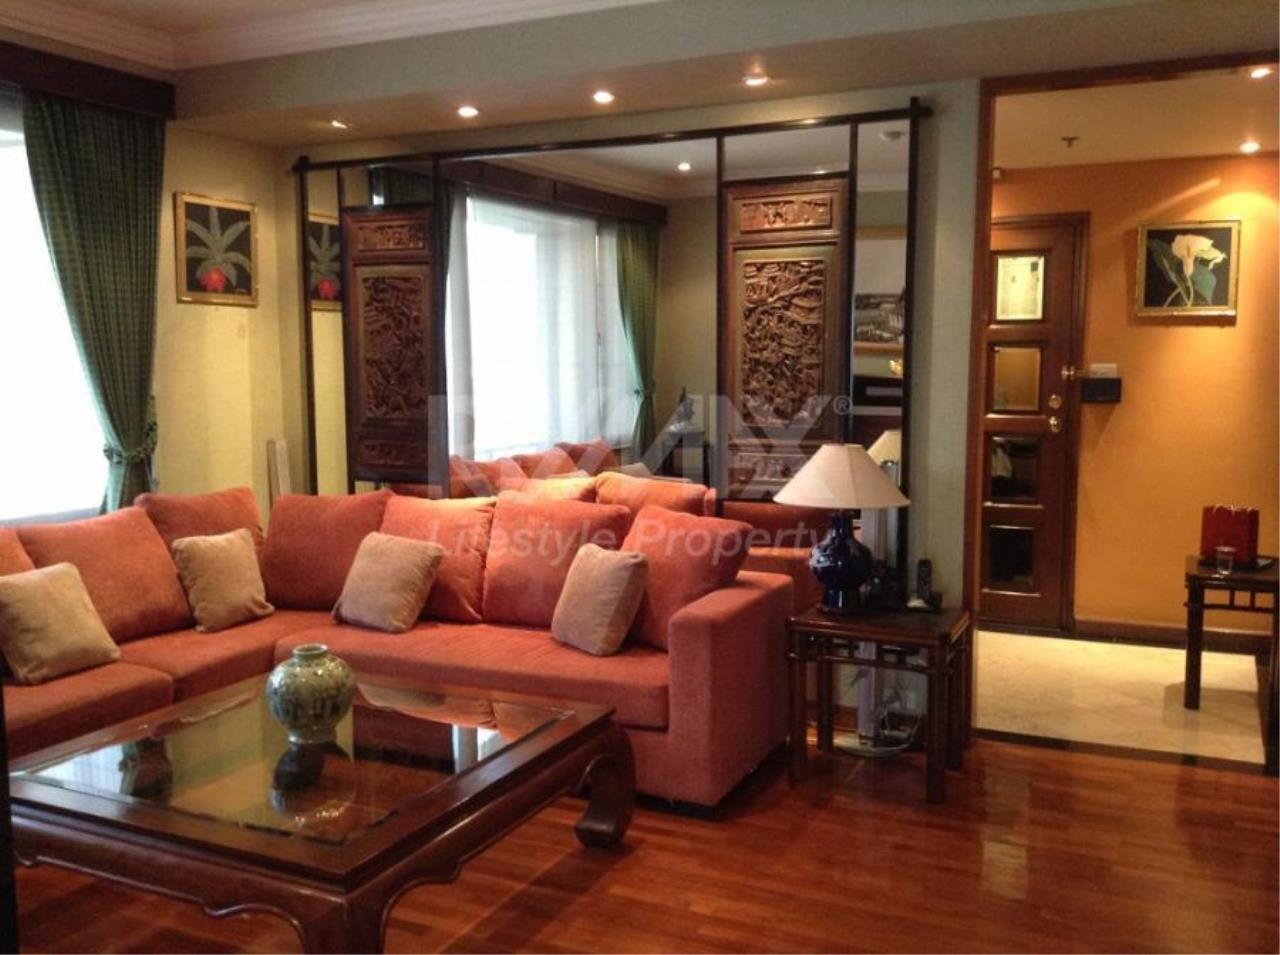 RE/MAX LifeStyle Property Agency's Baan Piya Sathorn 1